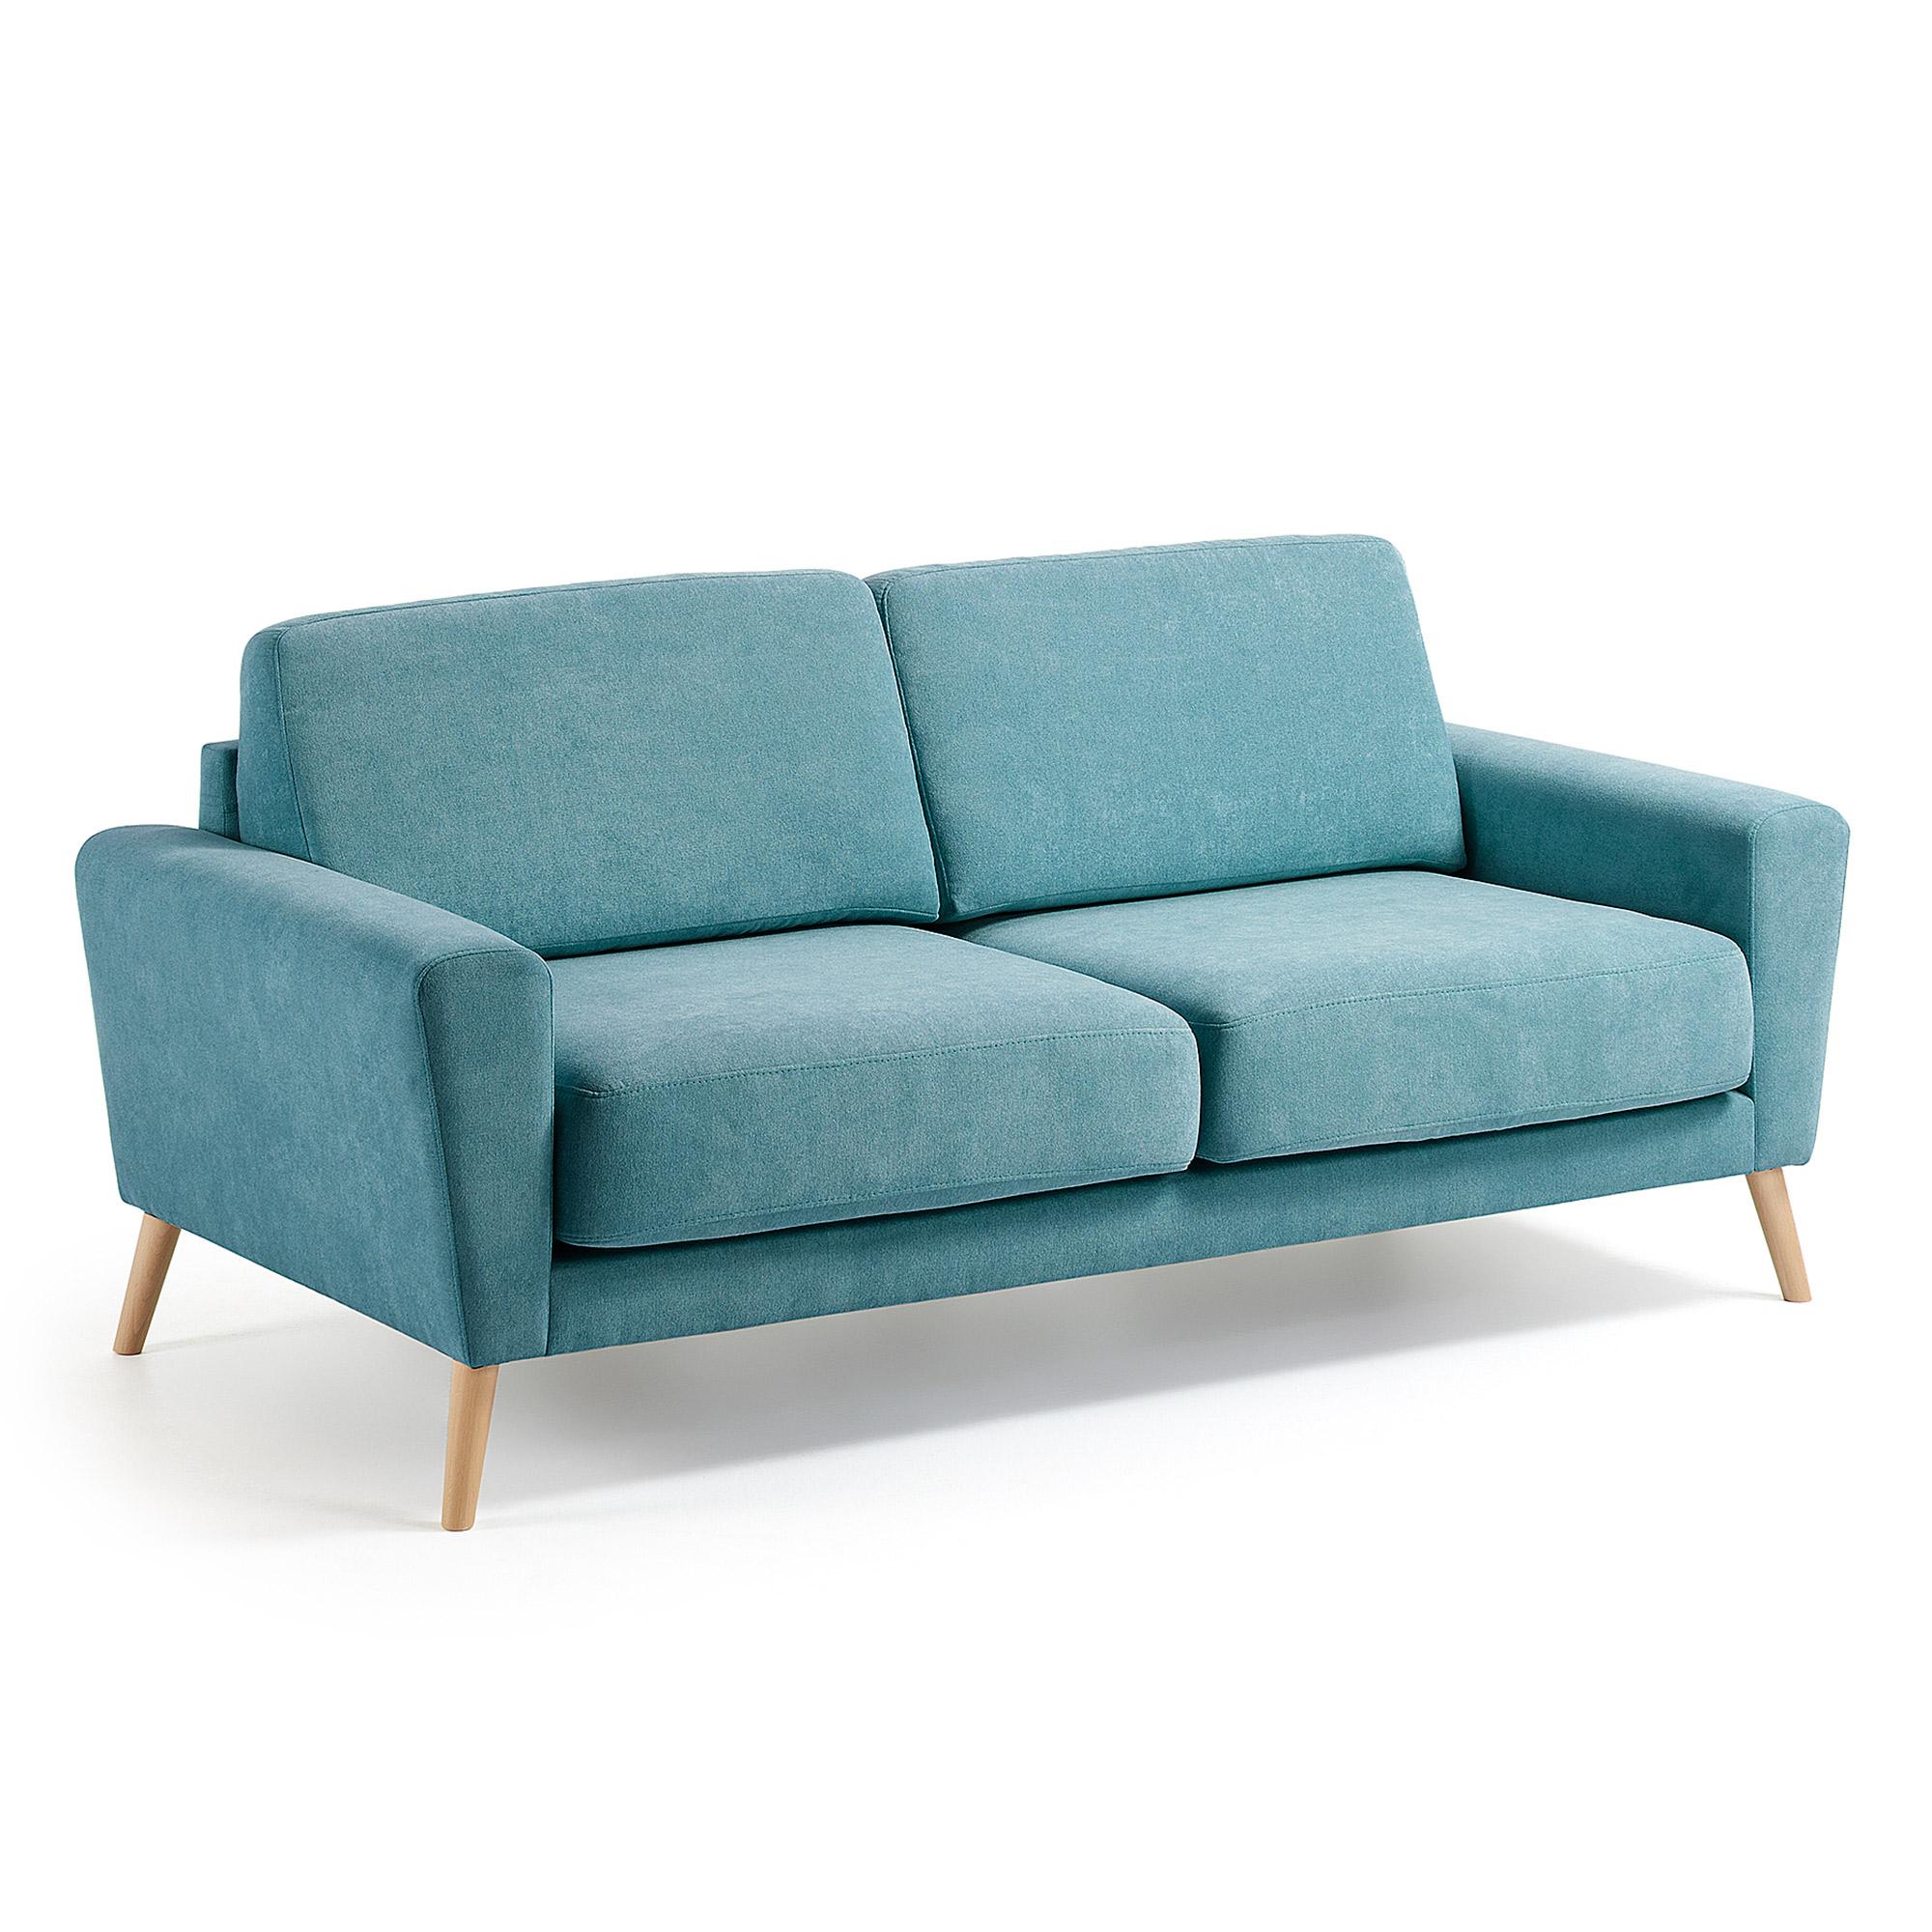 Kave Home driezitsbank 'Narnia', kleur turquoise Zitmeubelen | Bankstellen kopen